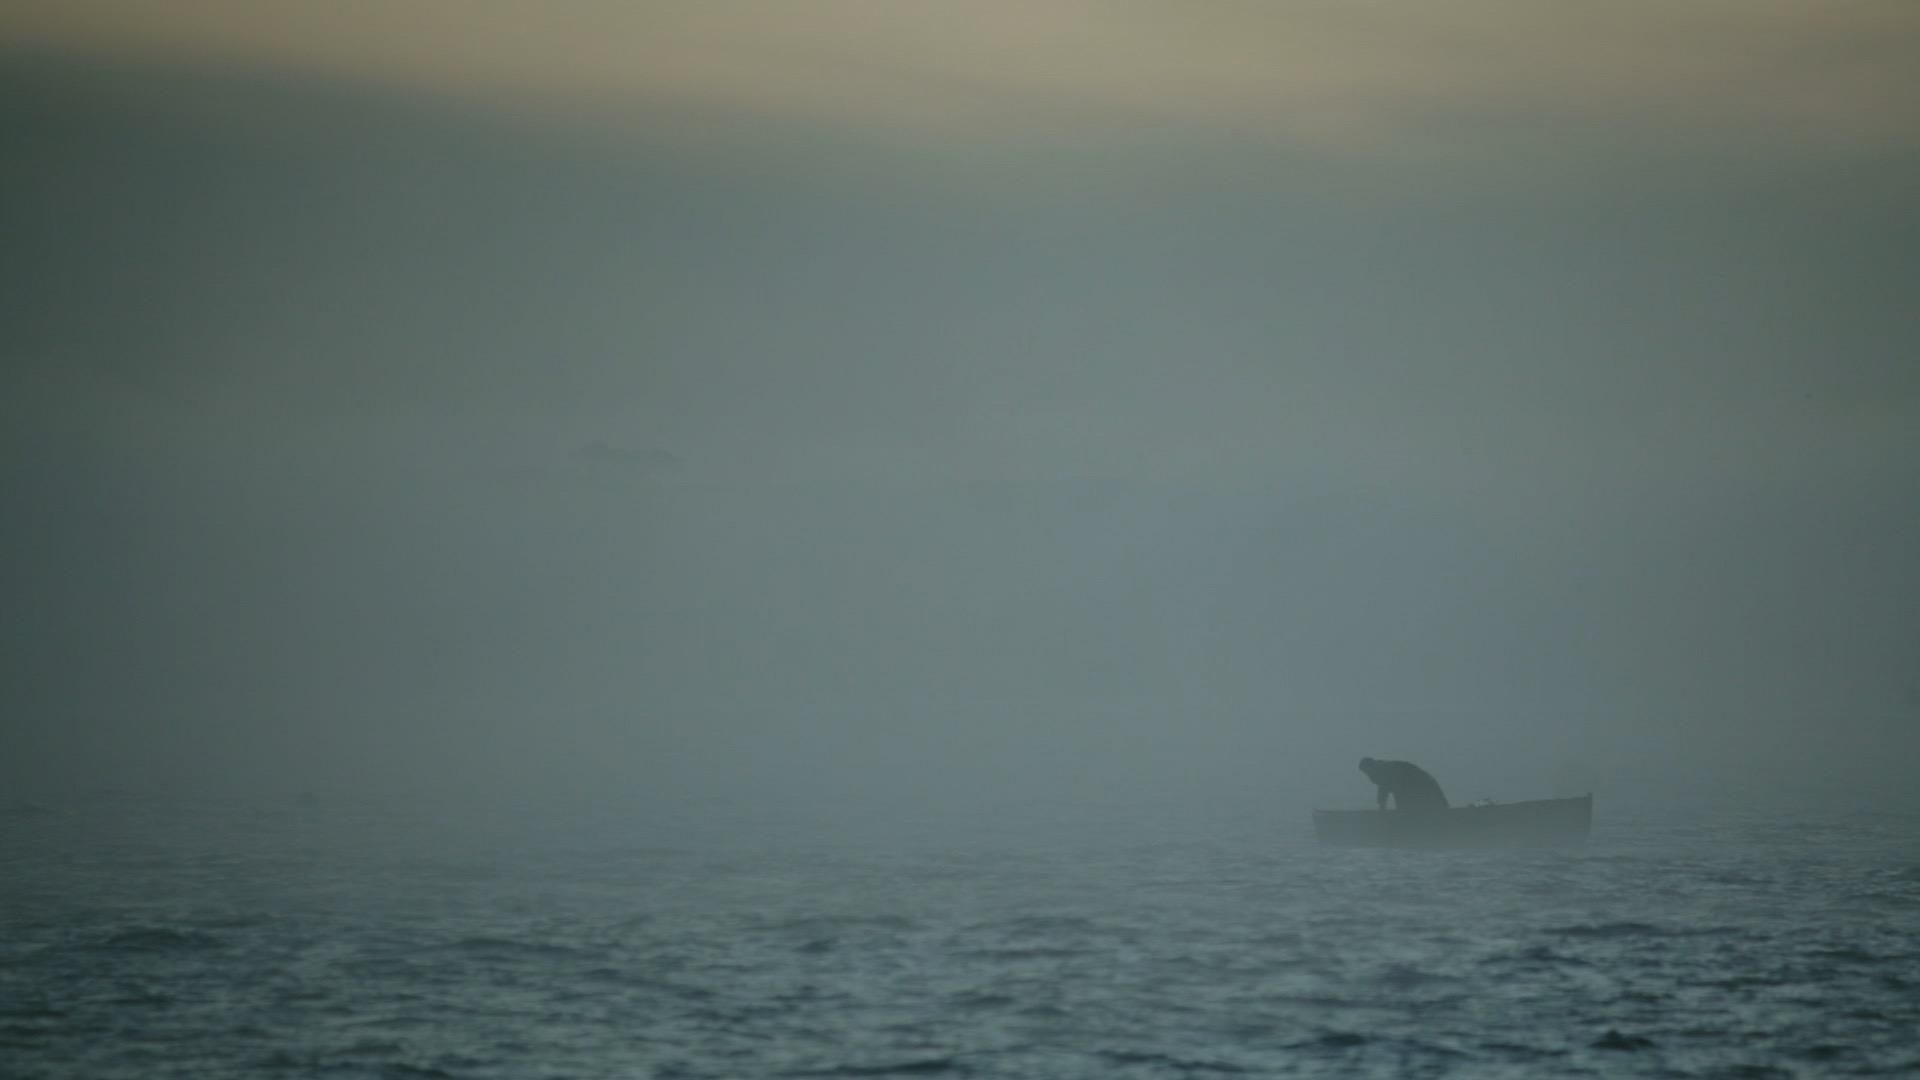 Fisherman_0001_Marker_378.jpg